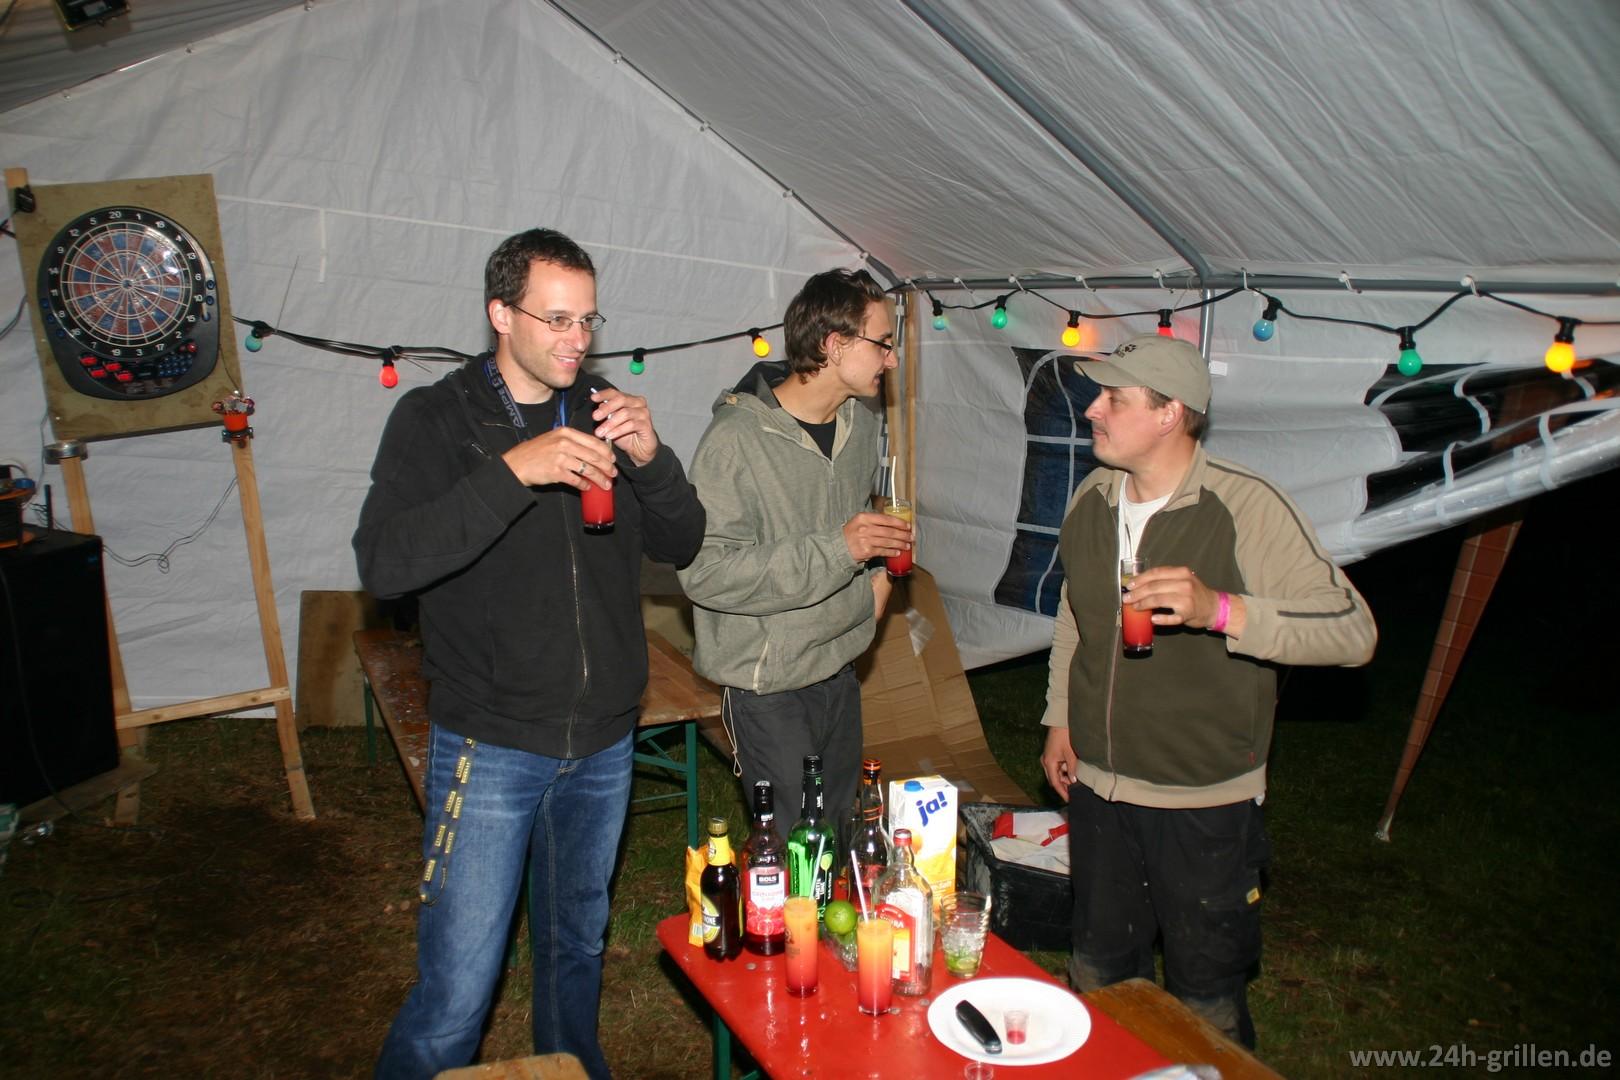 IMG_2011 (144)